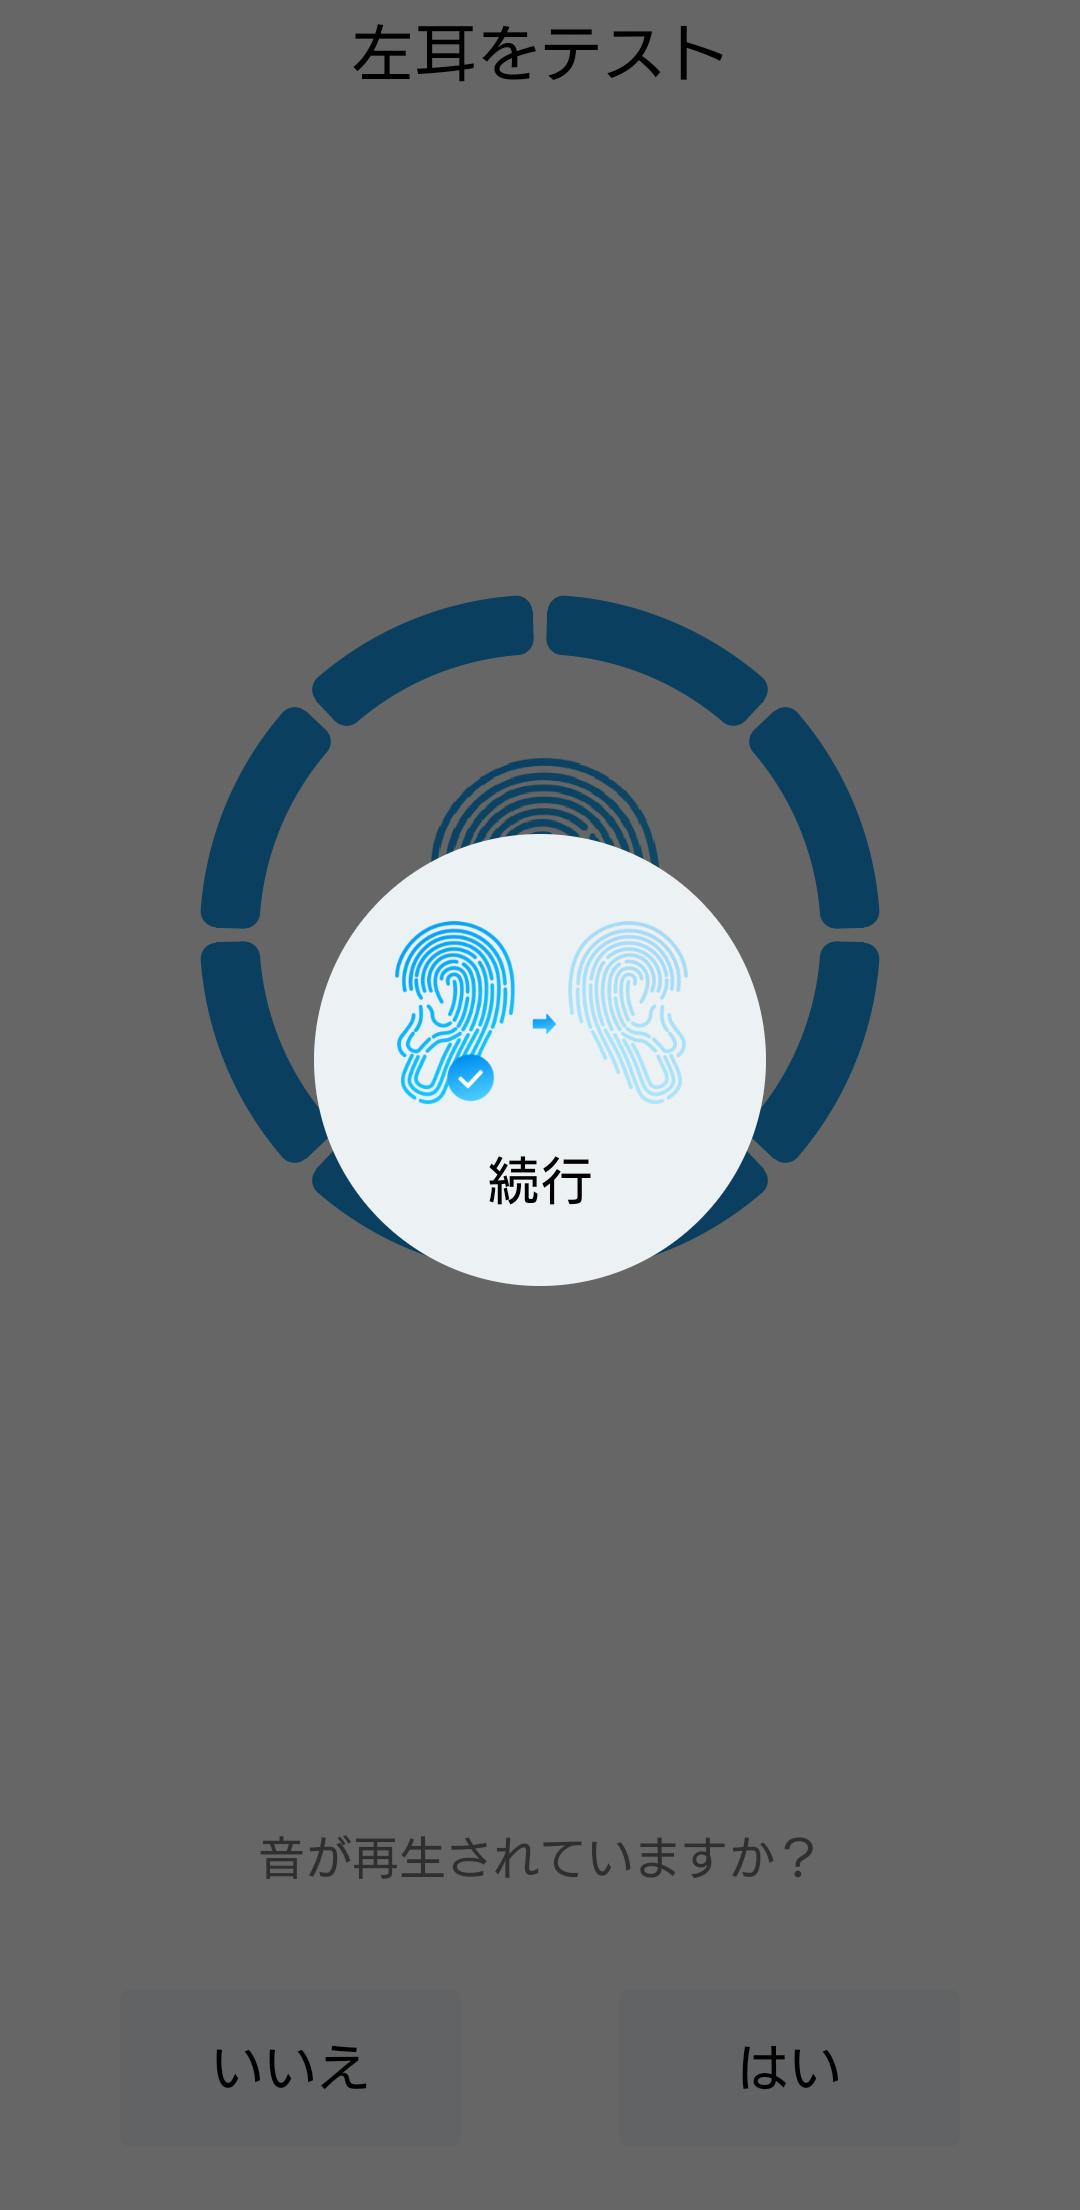 Screenshot 20210513 222452 - 【Anker】Soundcore Liberty Air 2 Proをレビュー!~コスパ抜群の機能性を搭載した完全ワイヤレスイヤホン!~